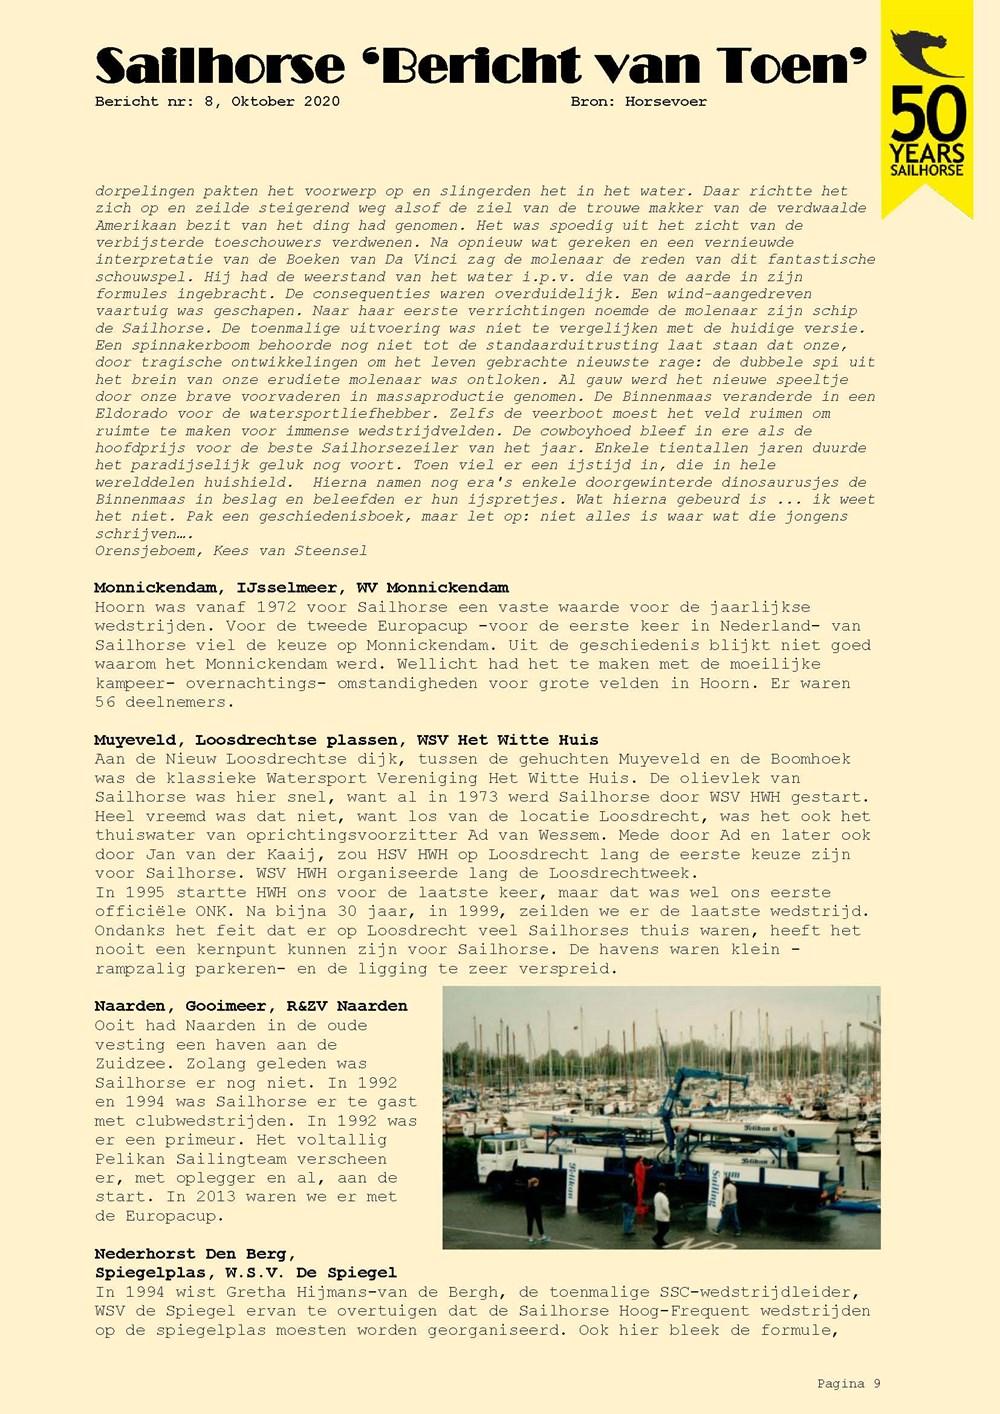 BvT8_Page_09.jpg